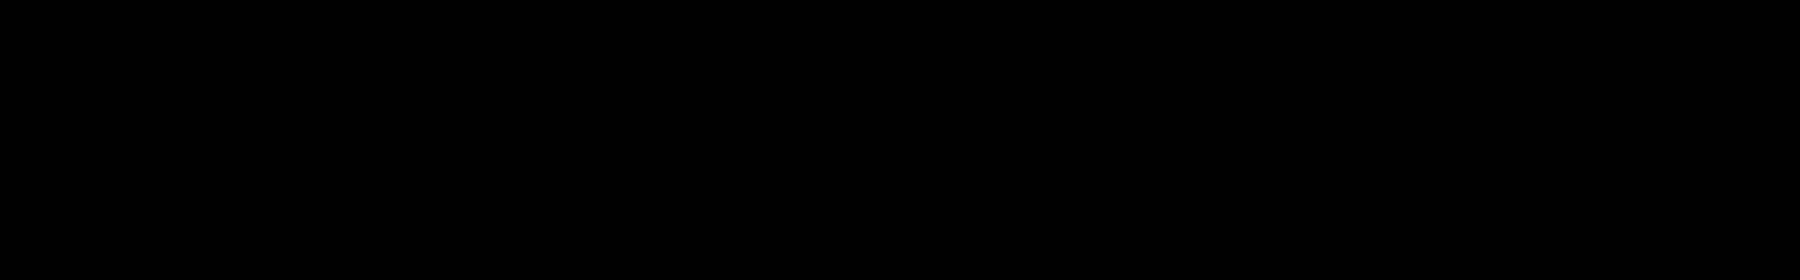 Kunundrum - Free WAV Samples audio waveform